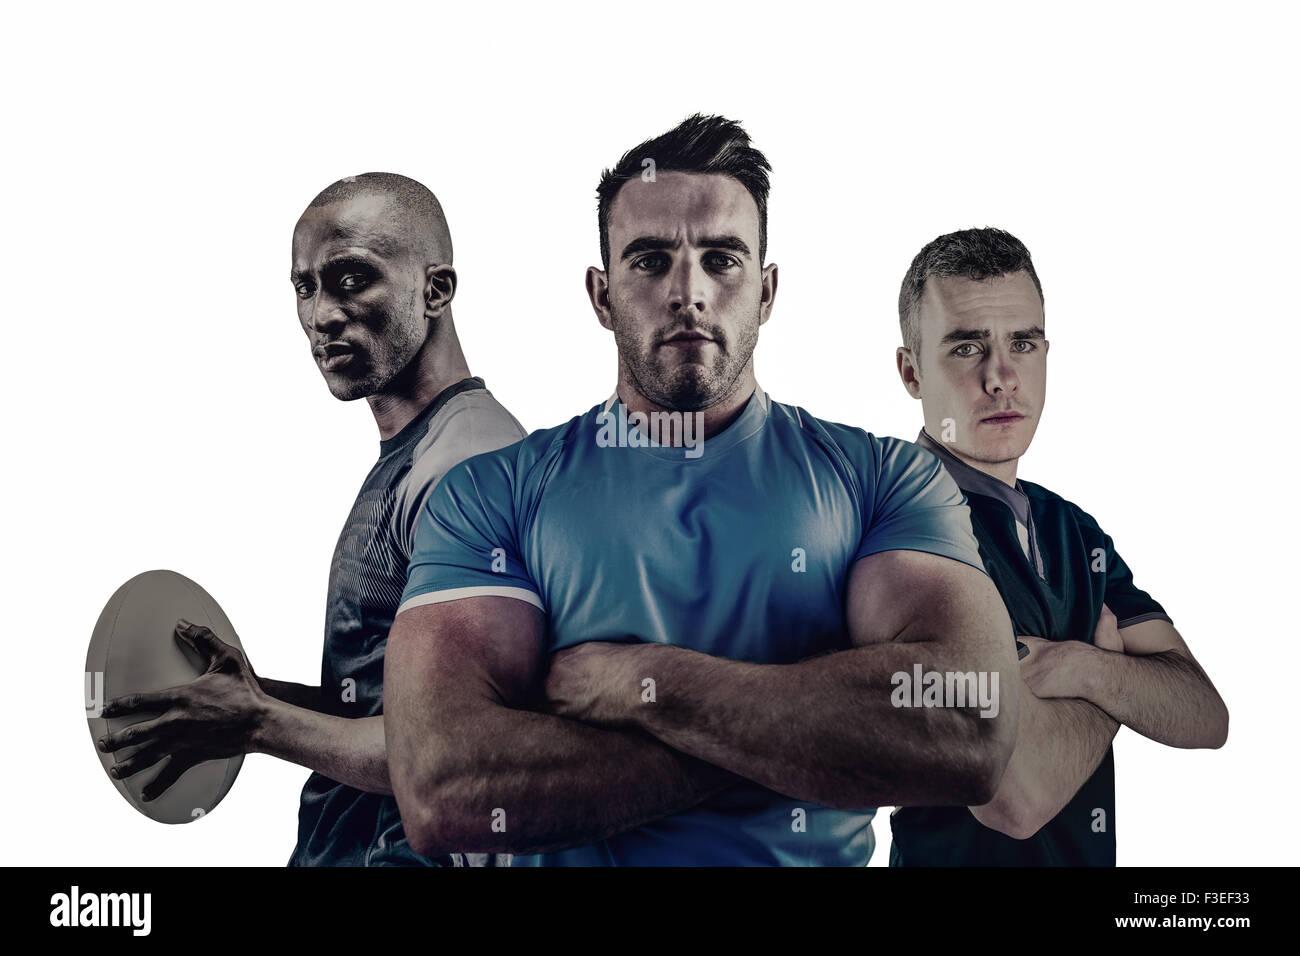 Grupo de jugadores de rugby dura Imagen De Stock